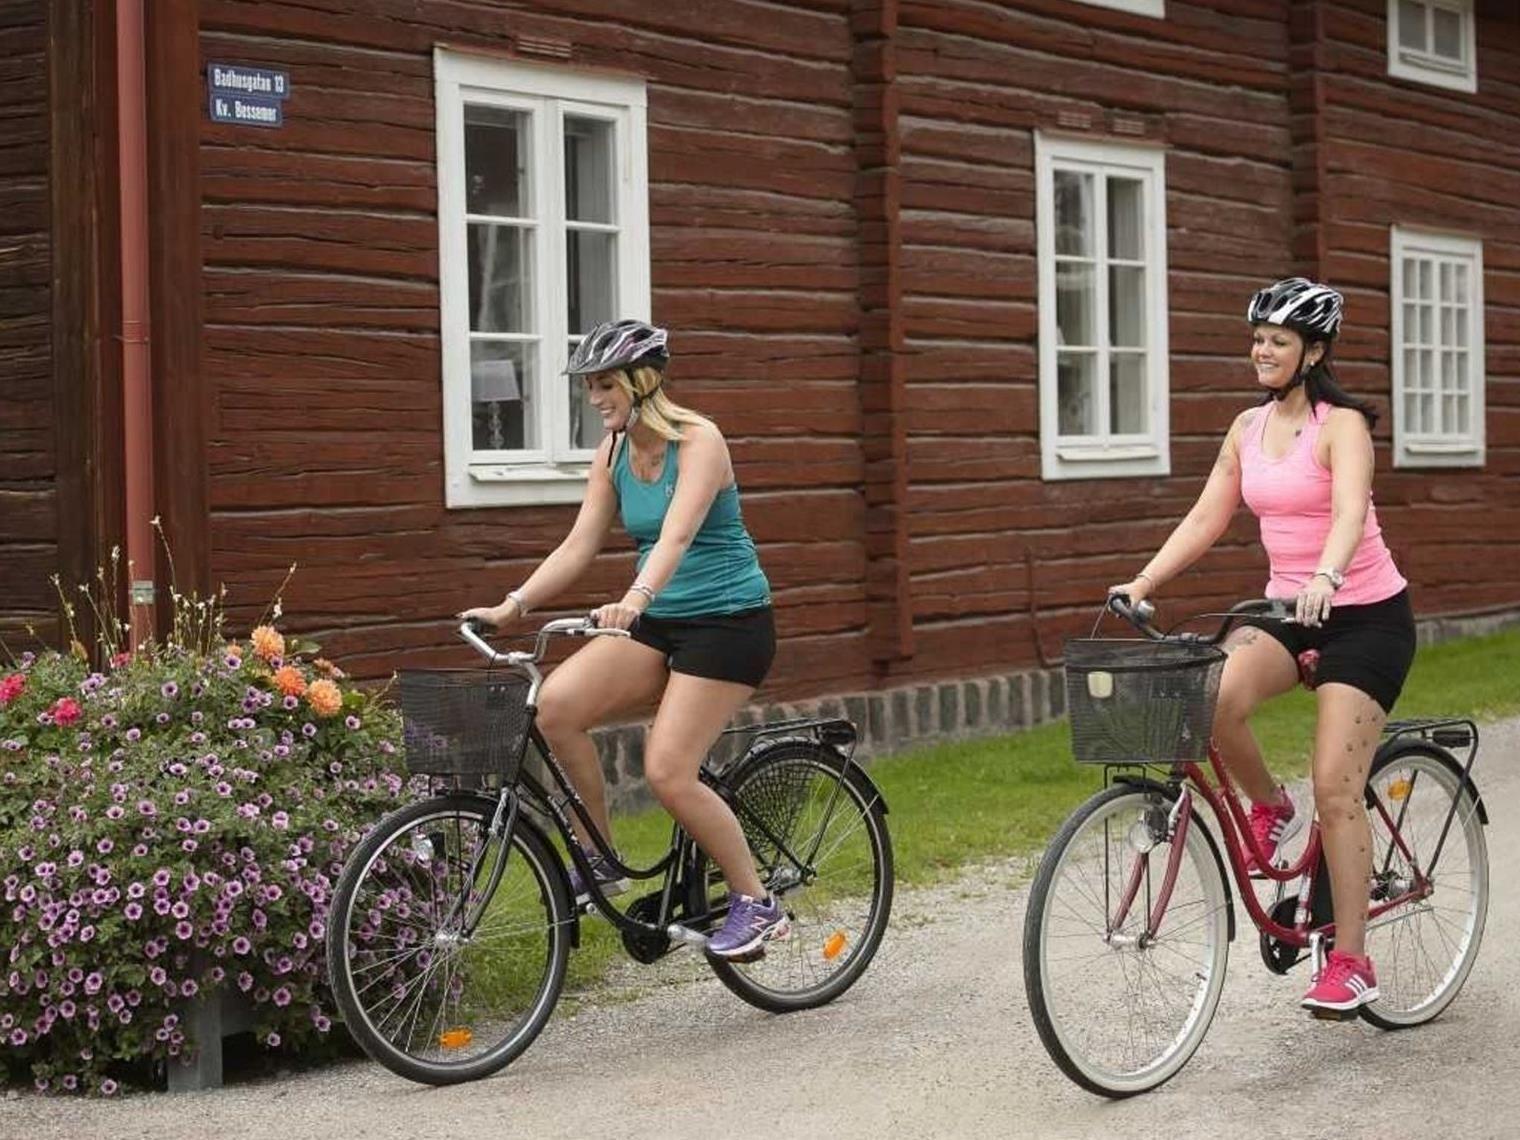 Cykeltur - Pirkvägen, Åsgarn - Grytnäs